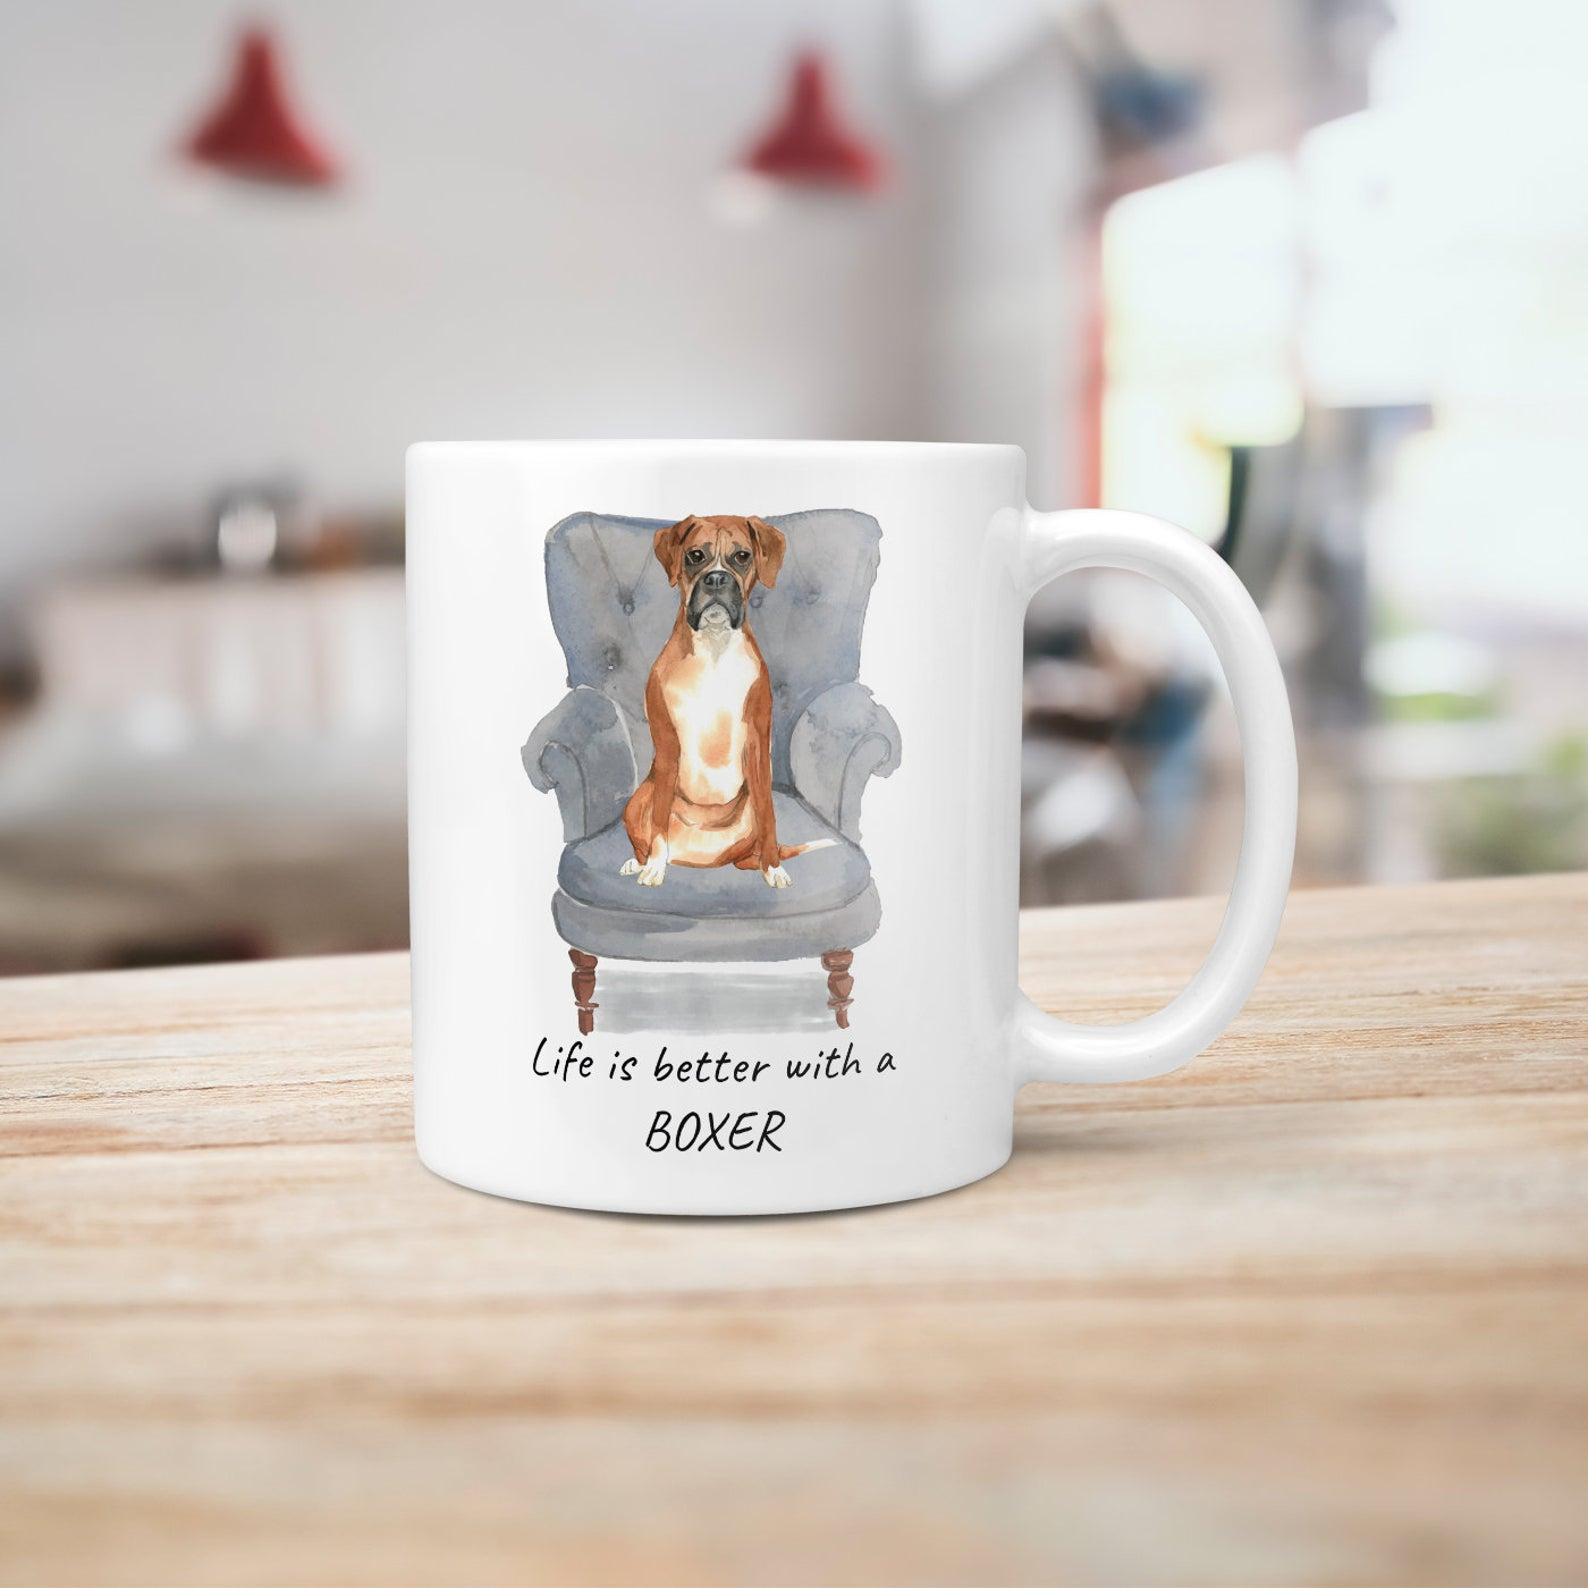 Life is Better with a Boxer Mug via MrsHenris on Etsy